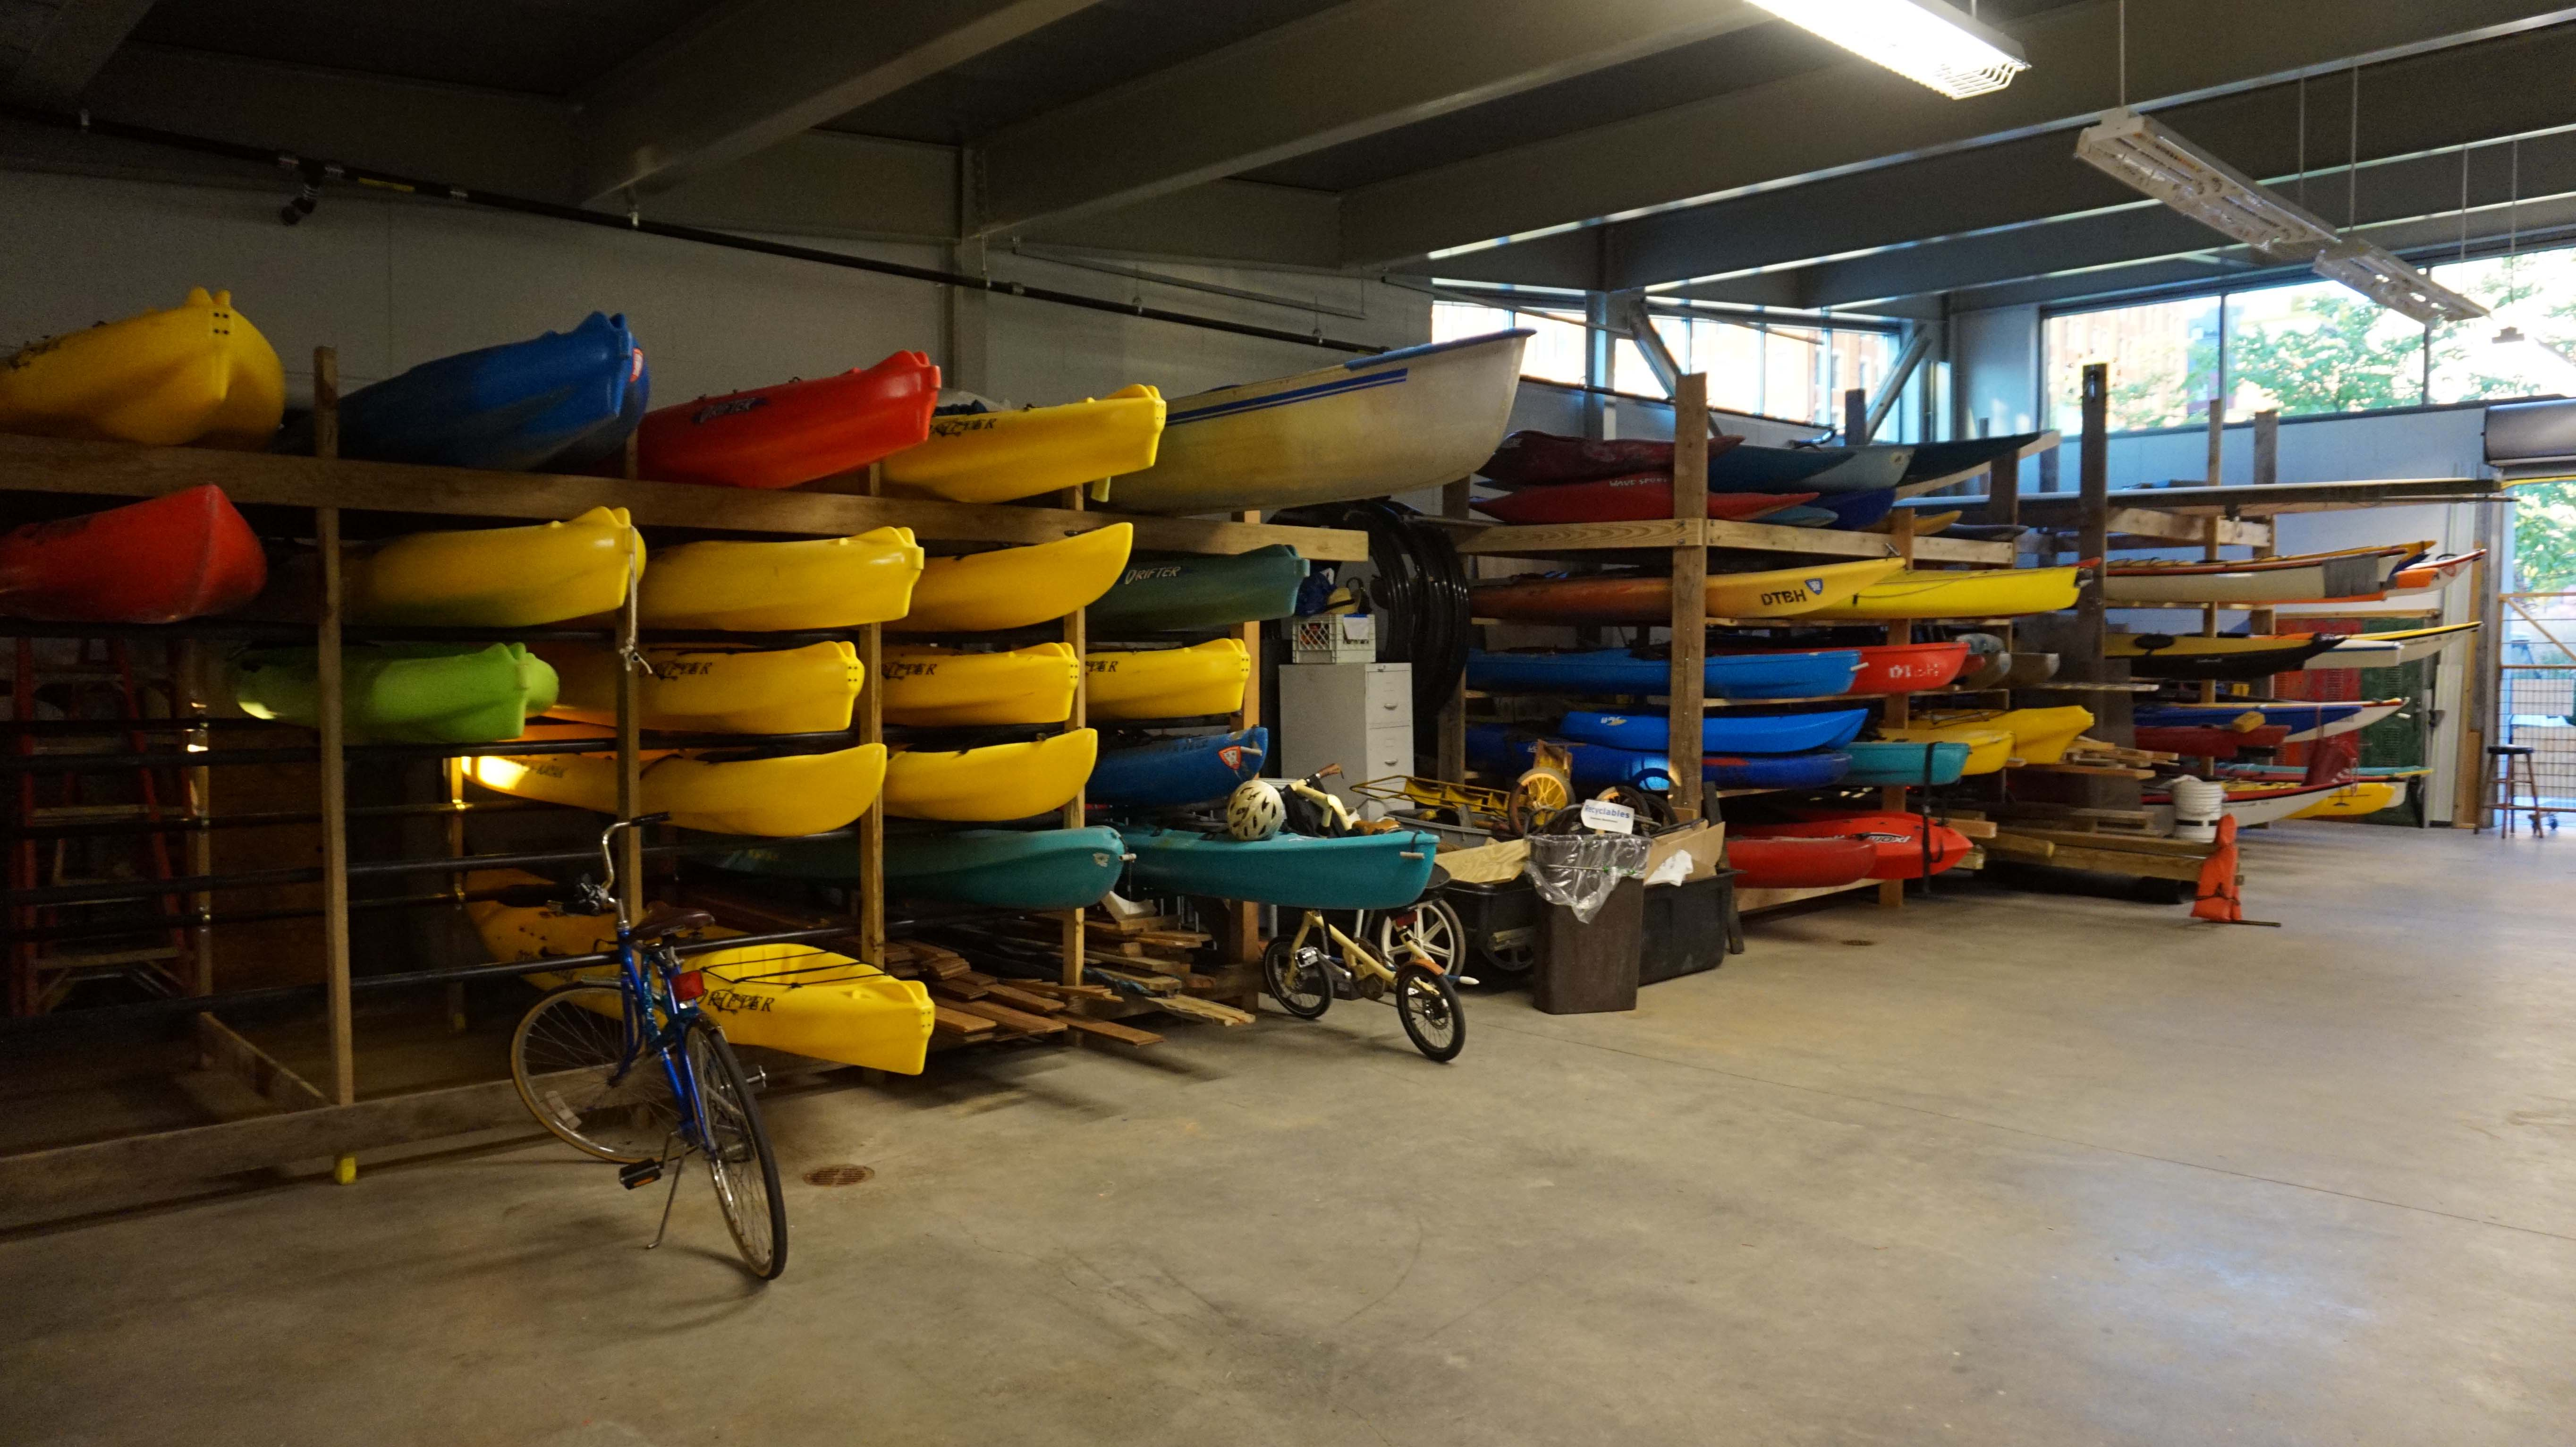 Boat house kayaks on racks